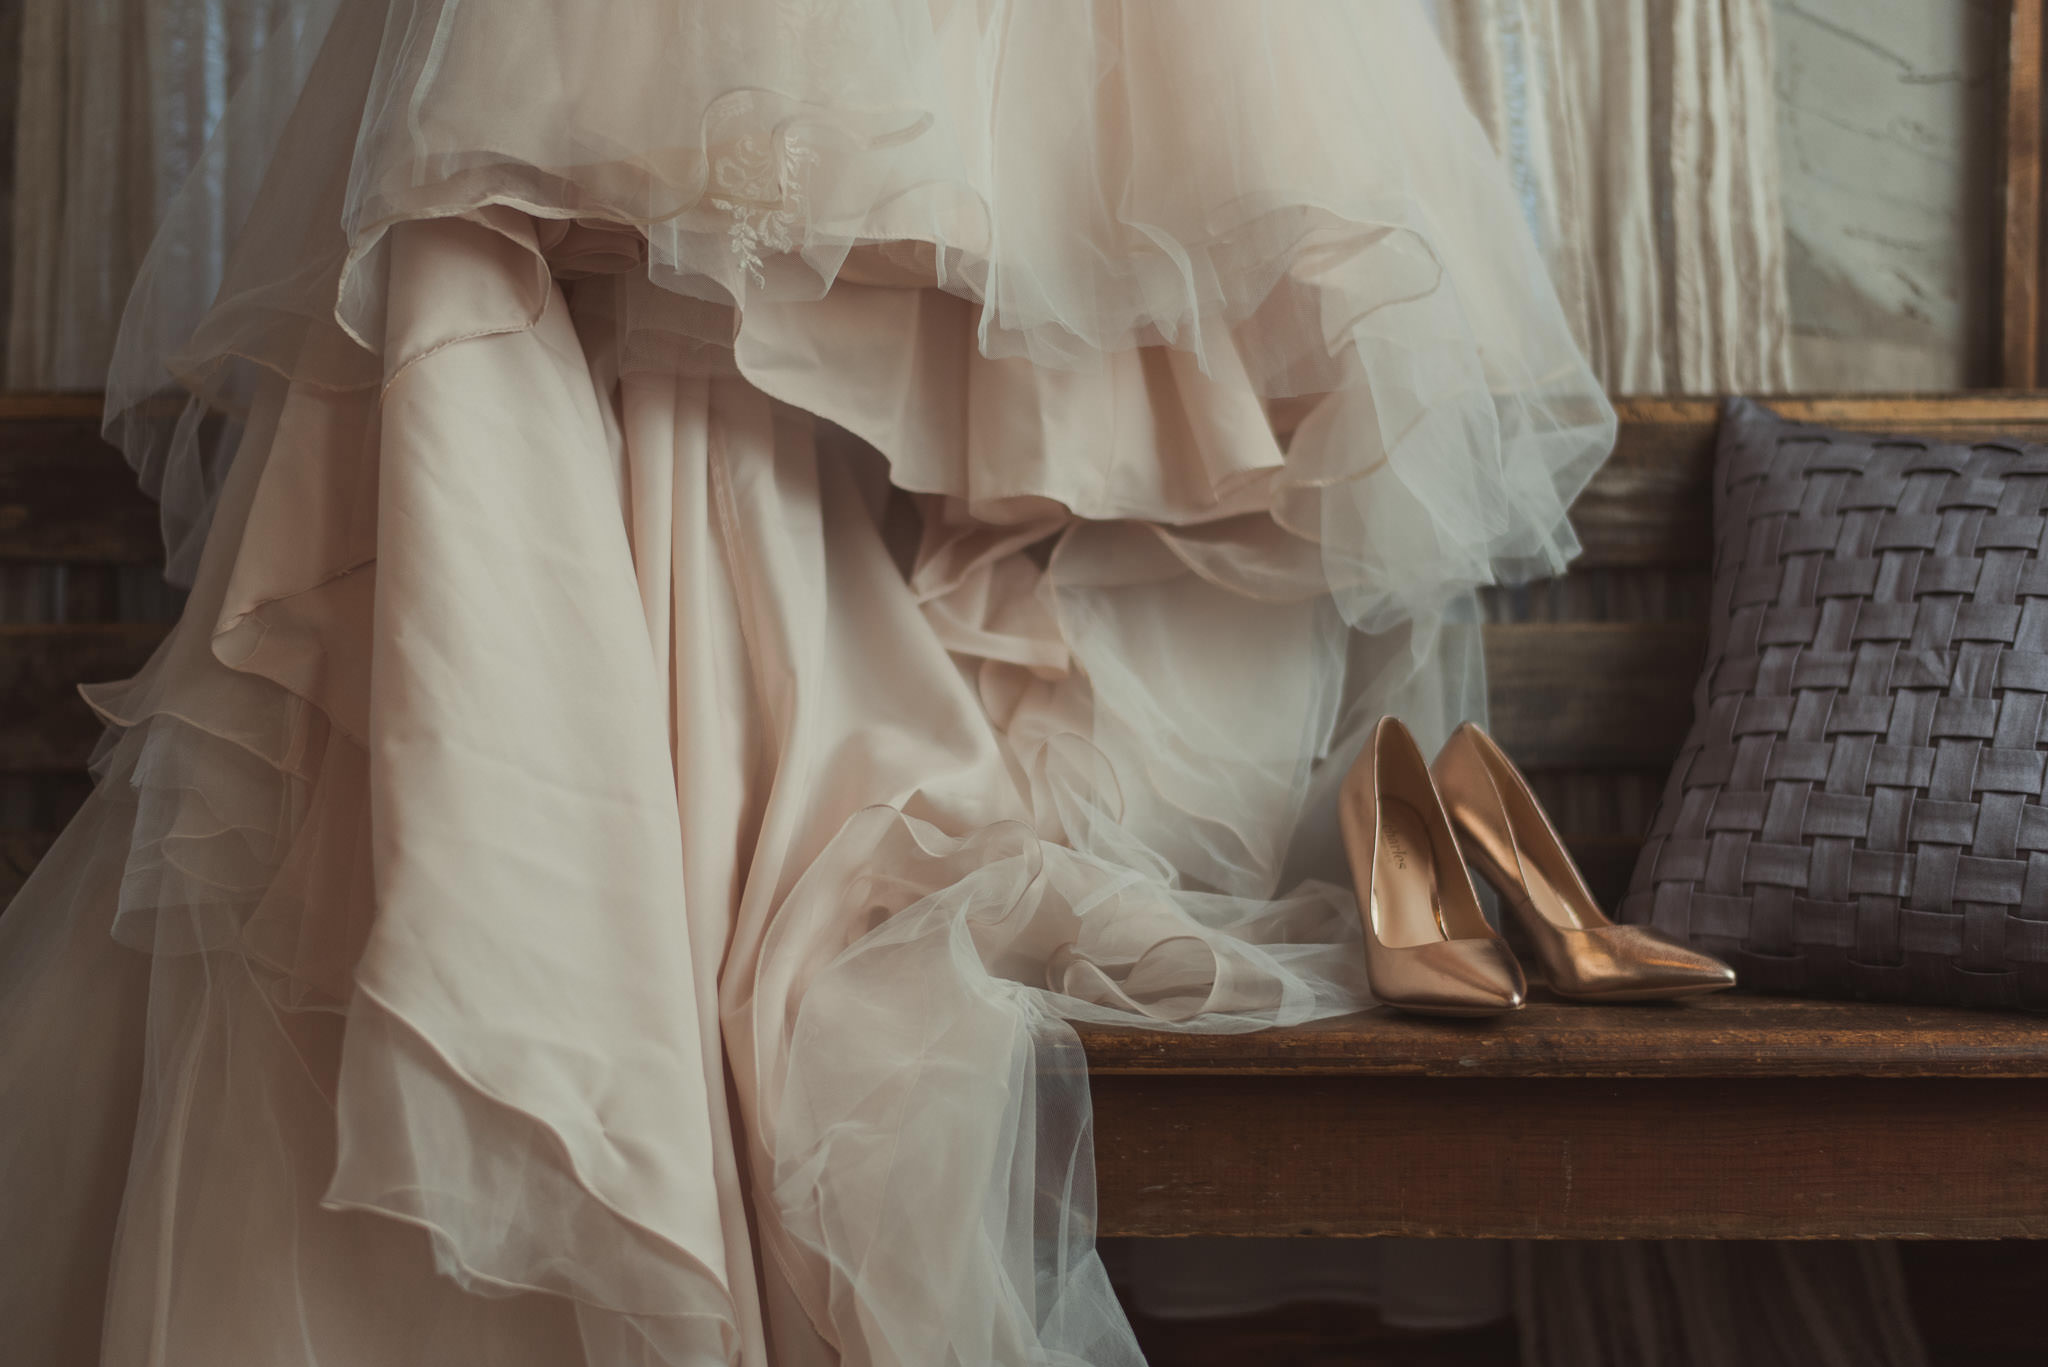 Cynthia-Curtis-Olde-Dobbine-Station-Houston-Wedding-Photographer-sm-9.jpg